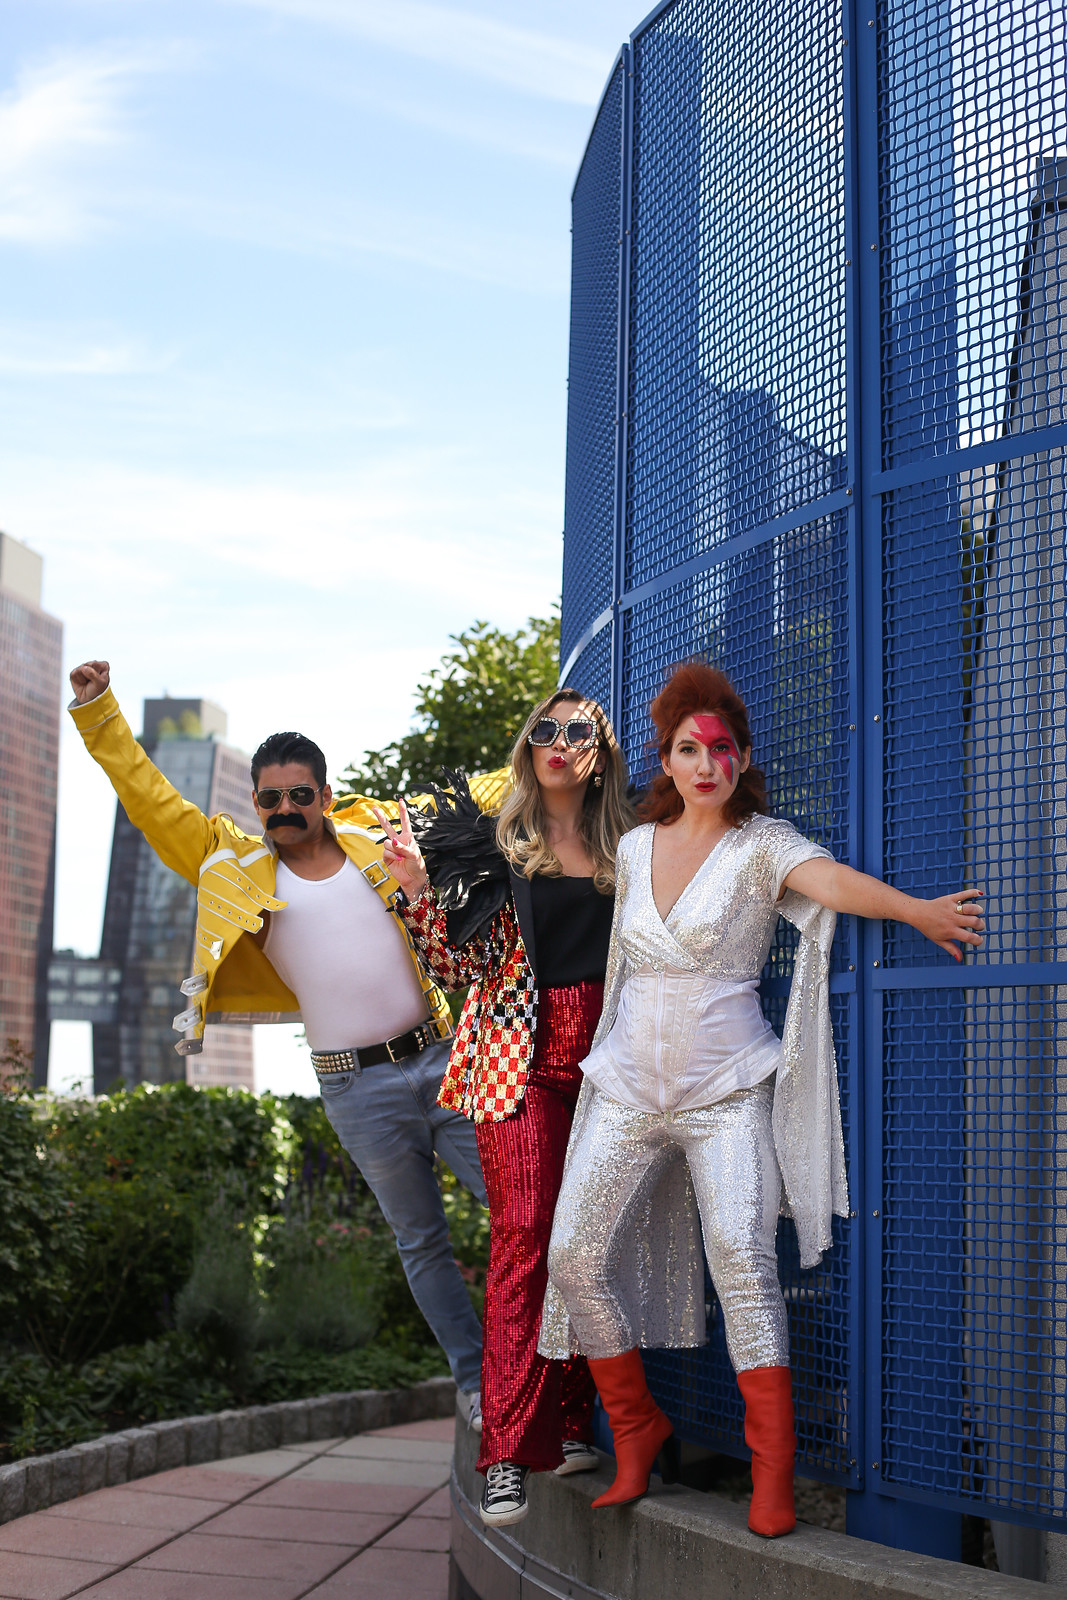 Group Halloween Costumes | Rock Legends | Legendary Rockstars | Elton John Freddie Mercury Queen David Bowie Selena | Glam Sequin Costumes